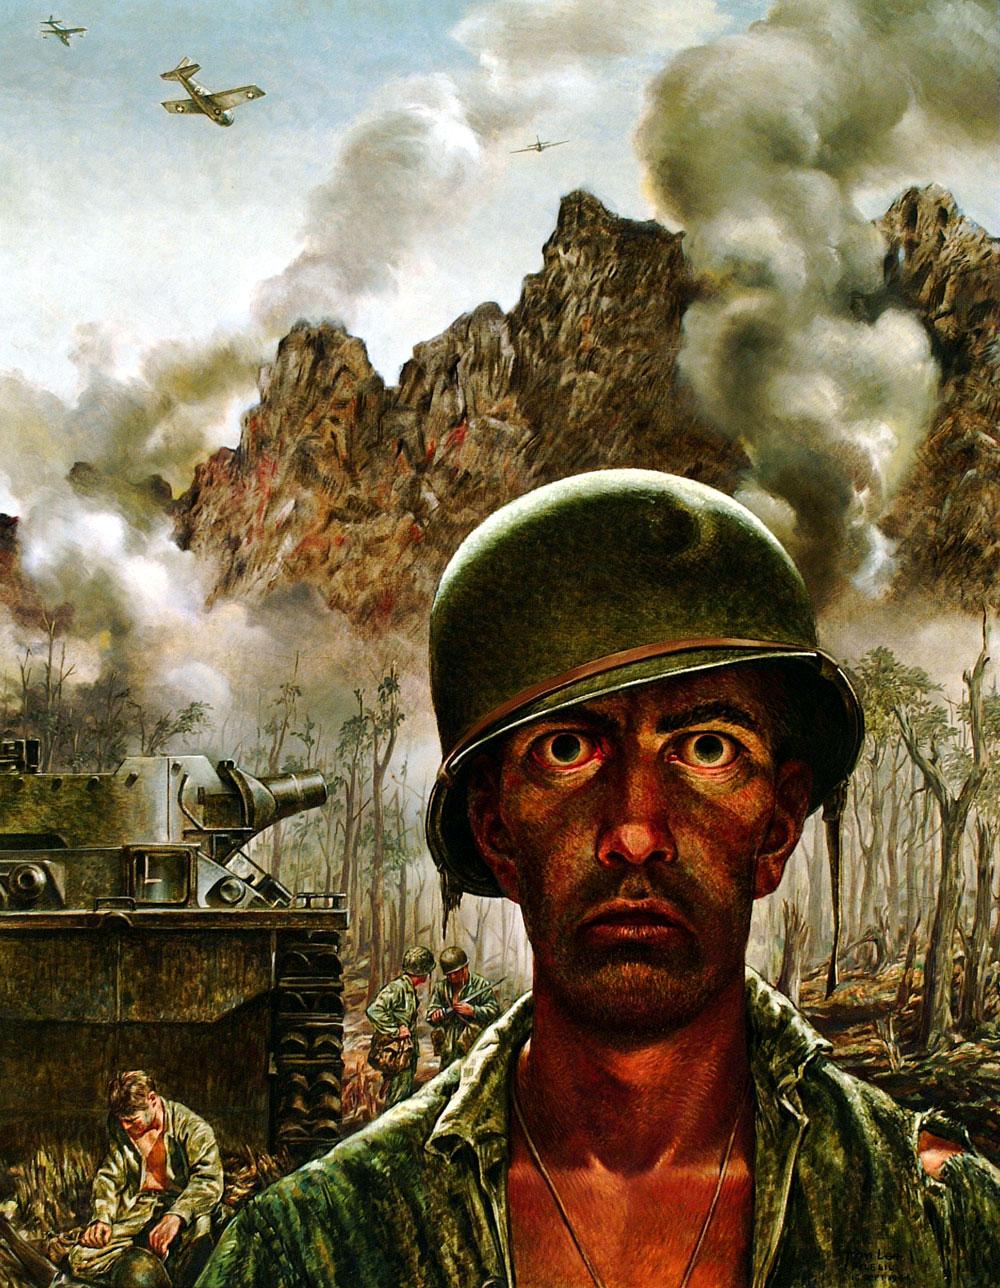 Tom Lea, The 2,000-Yard Stare, 1944. Oil on canvas.